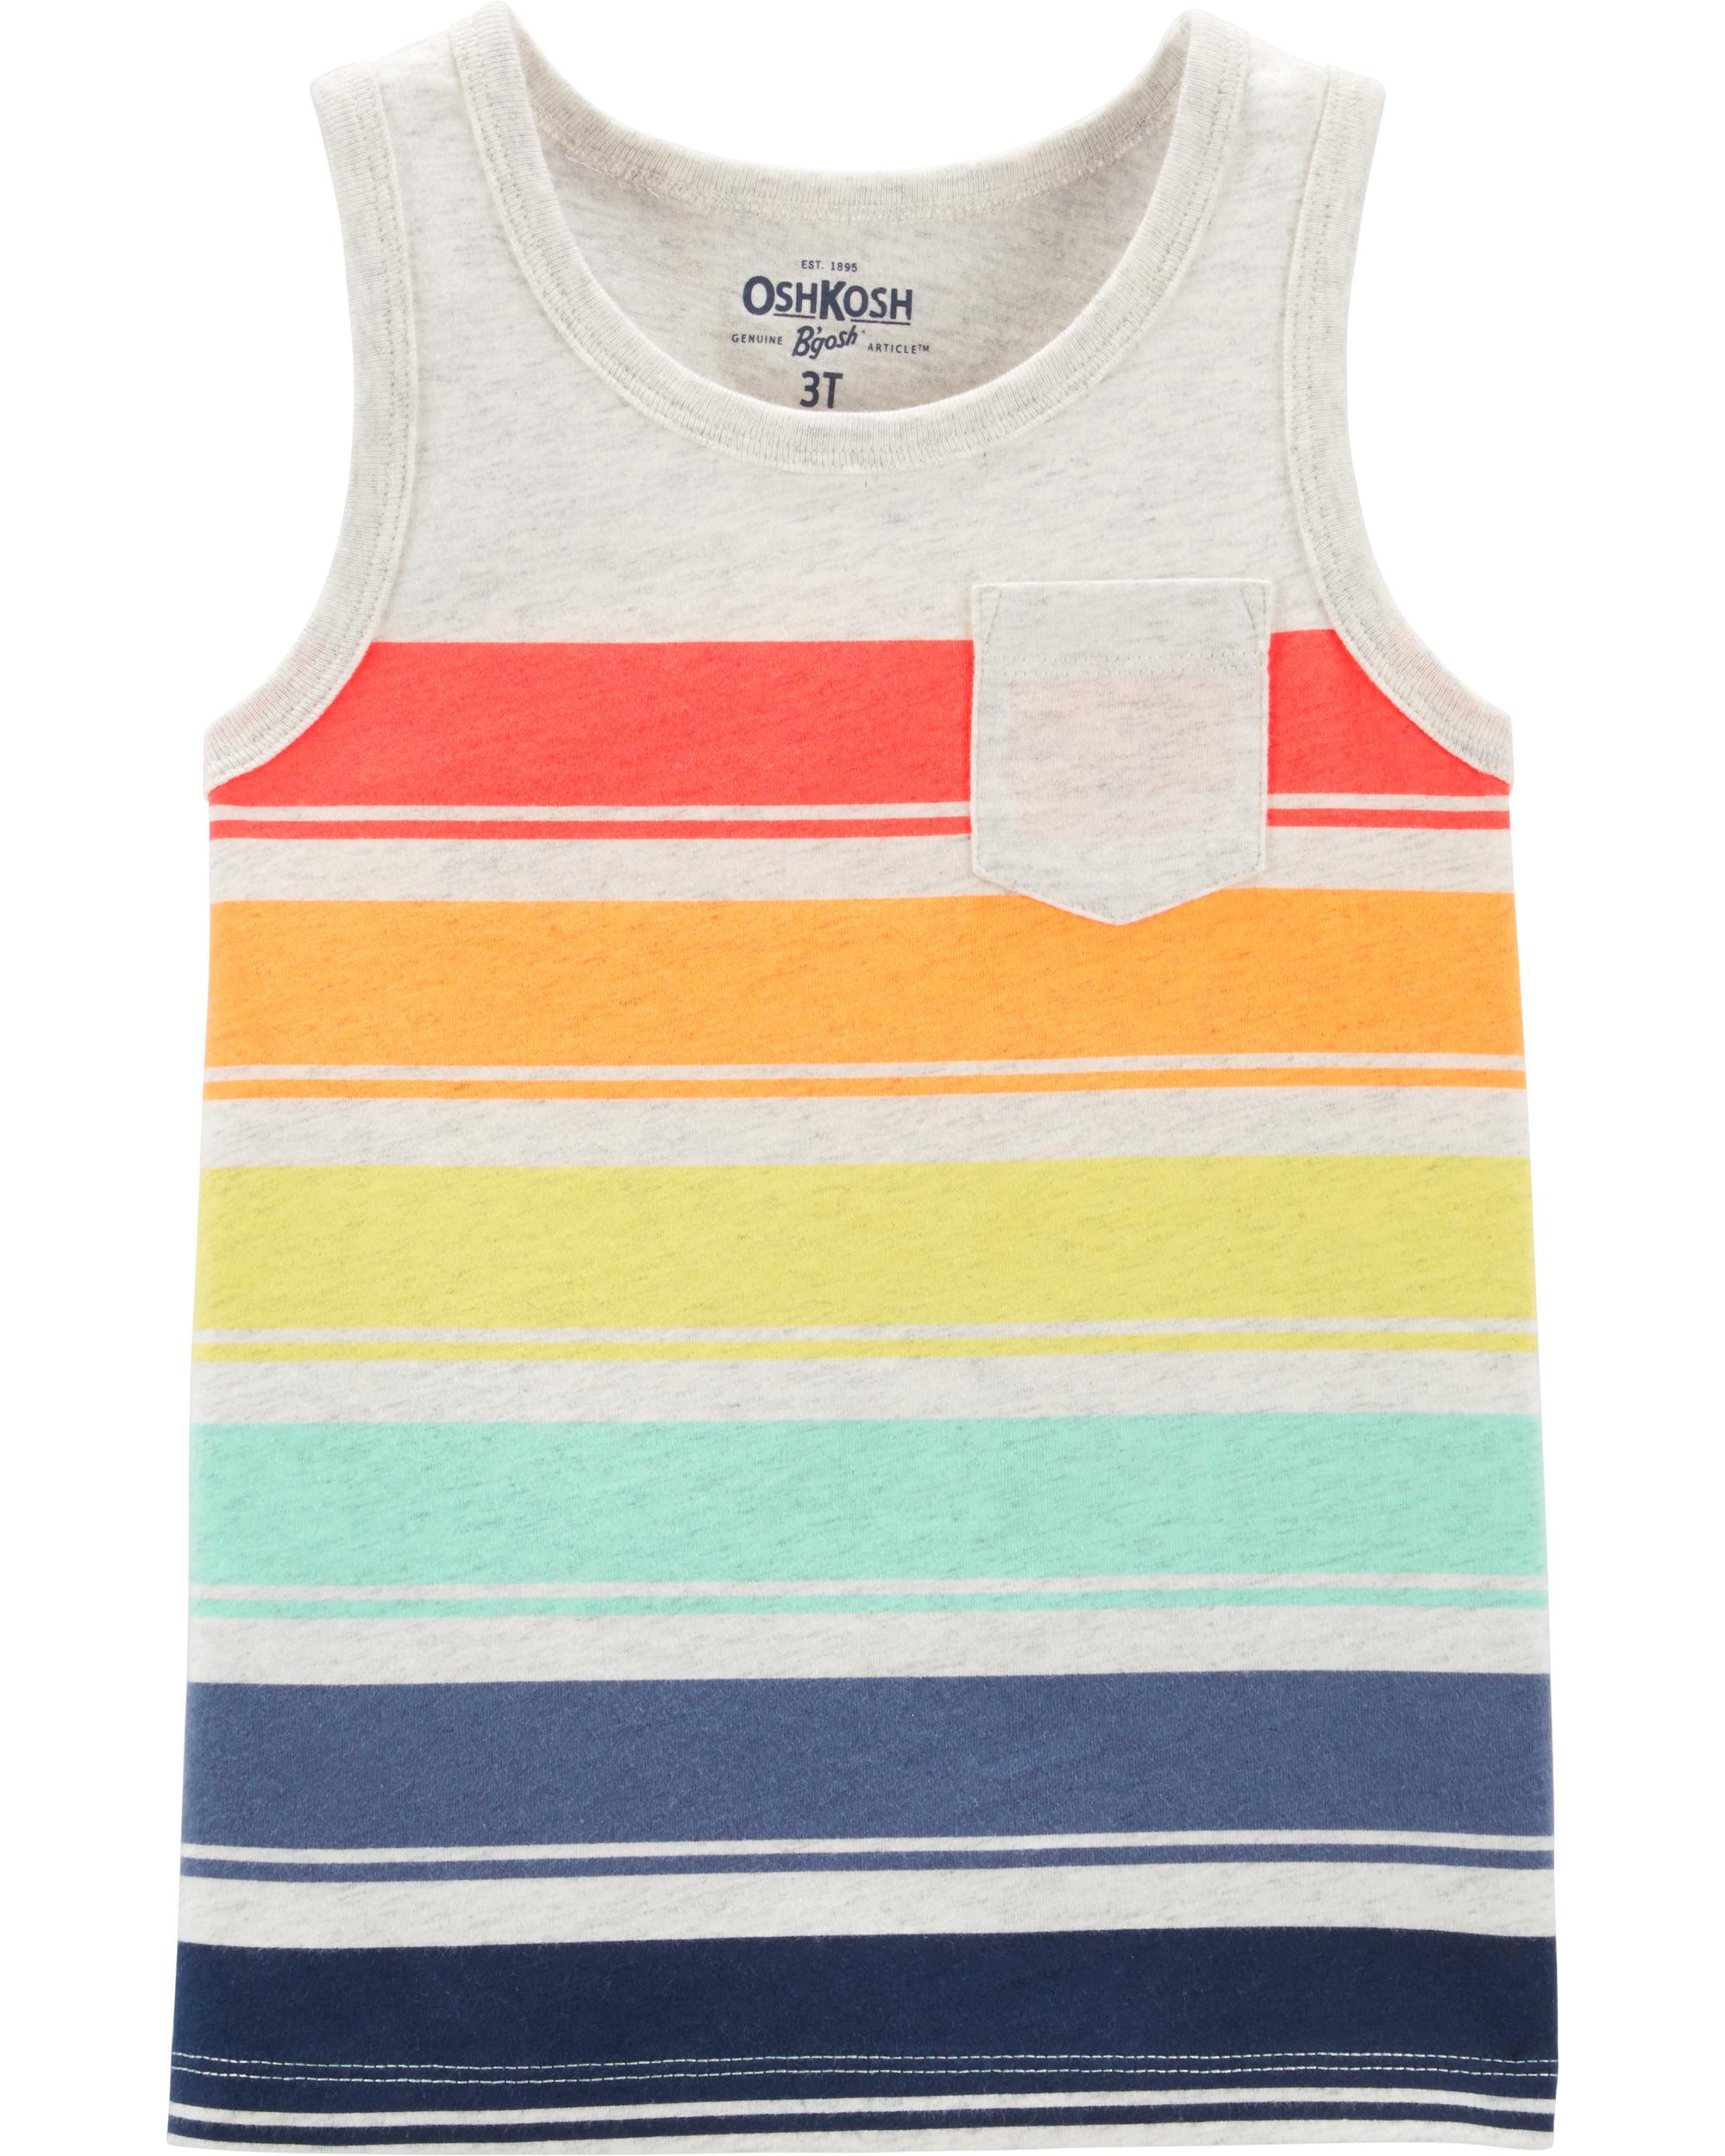 Carters Little Boys Striped Tank Pocket Shirt